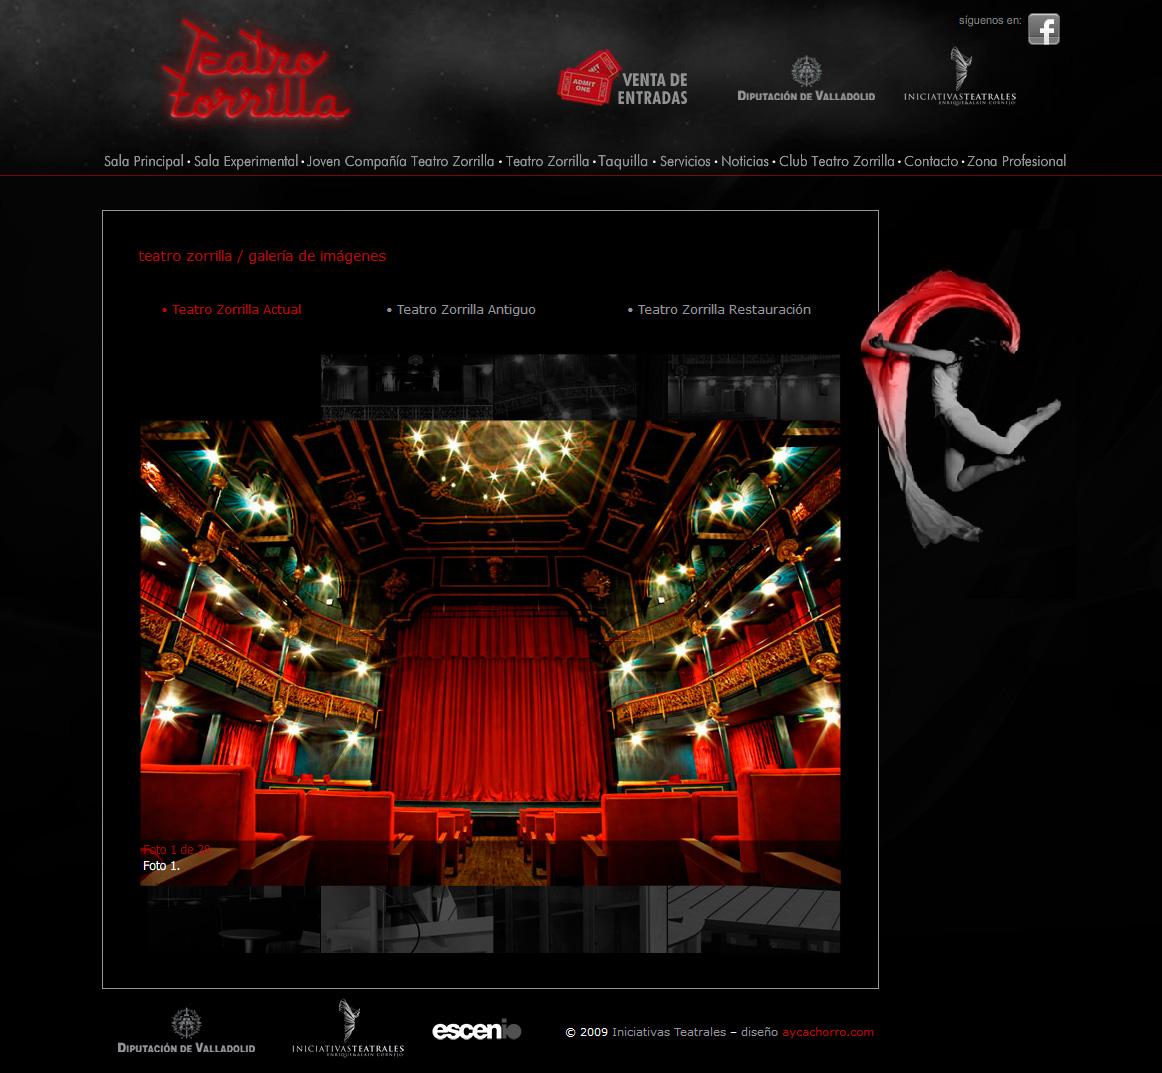 Teatro Zorrilla Valladolid